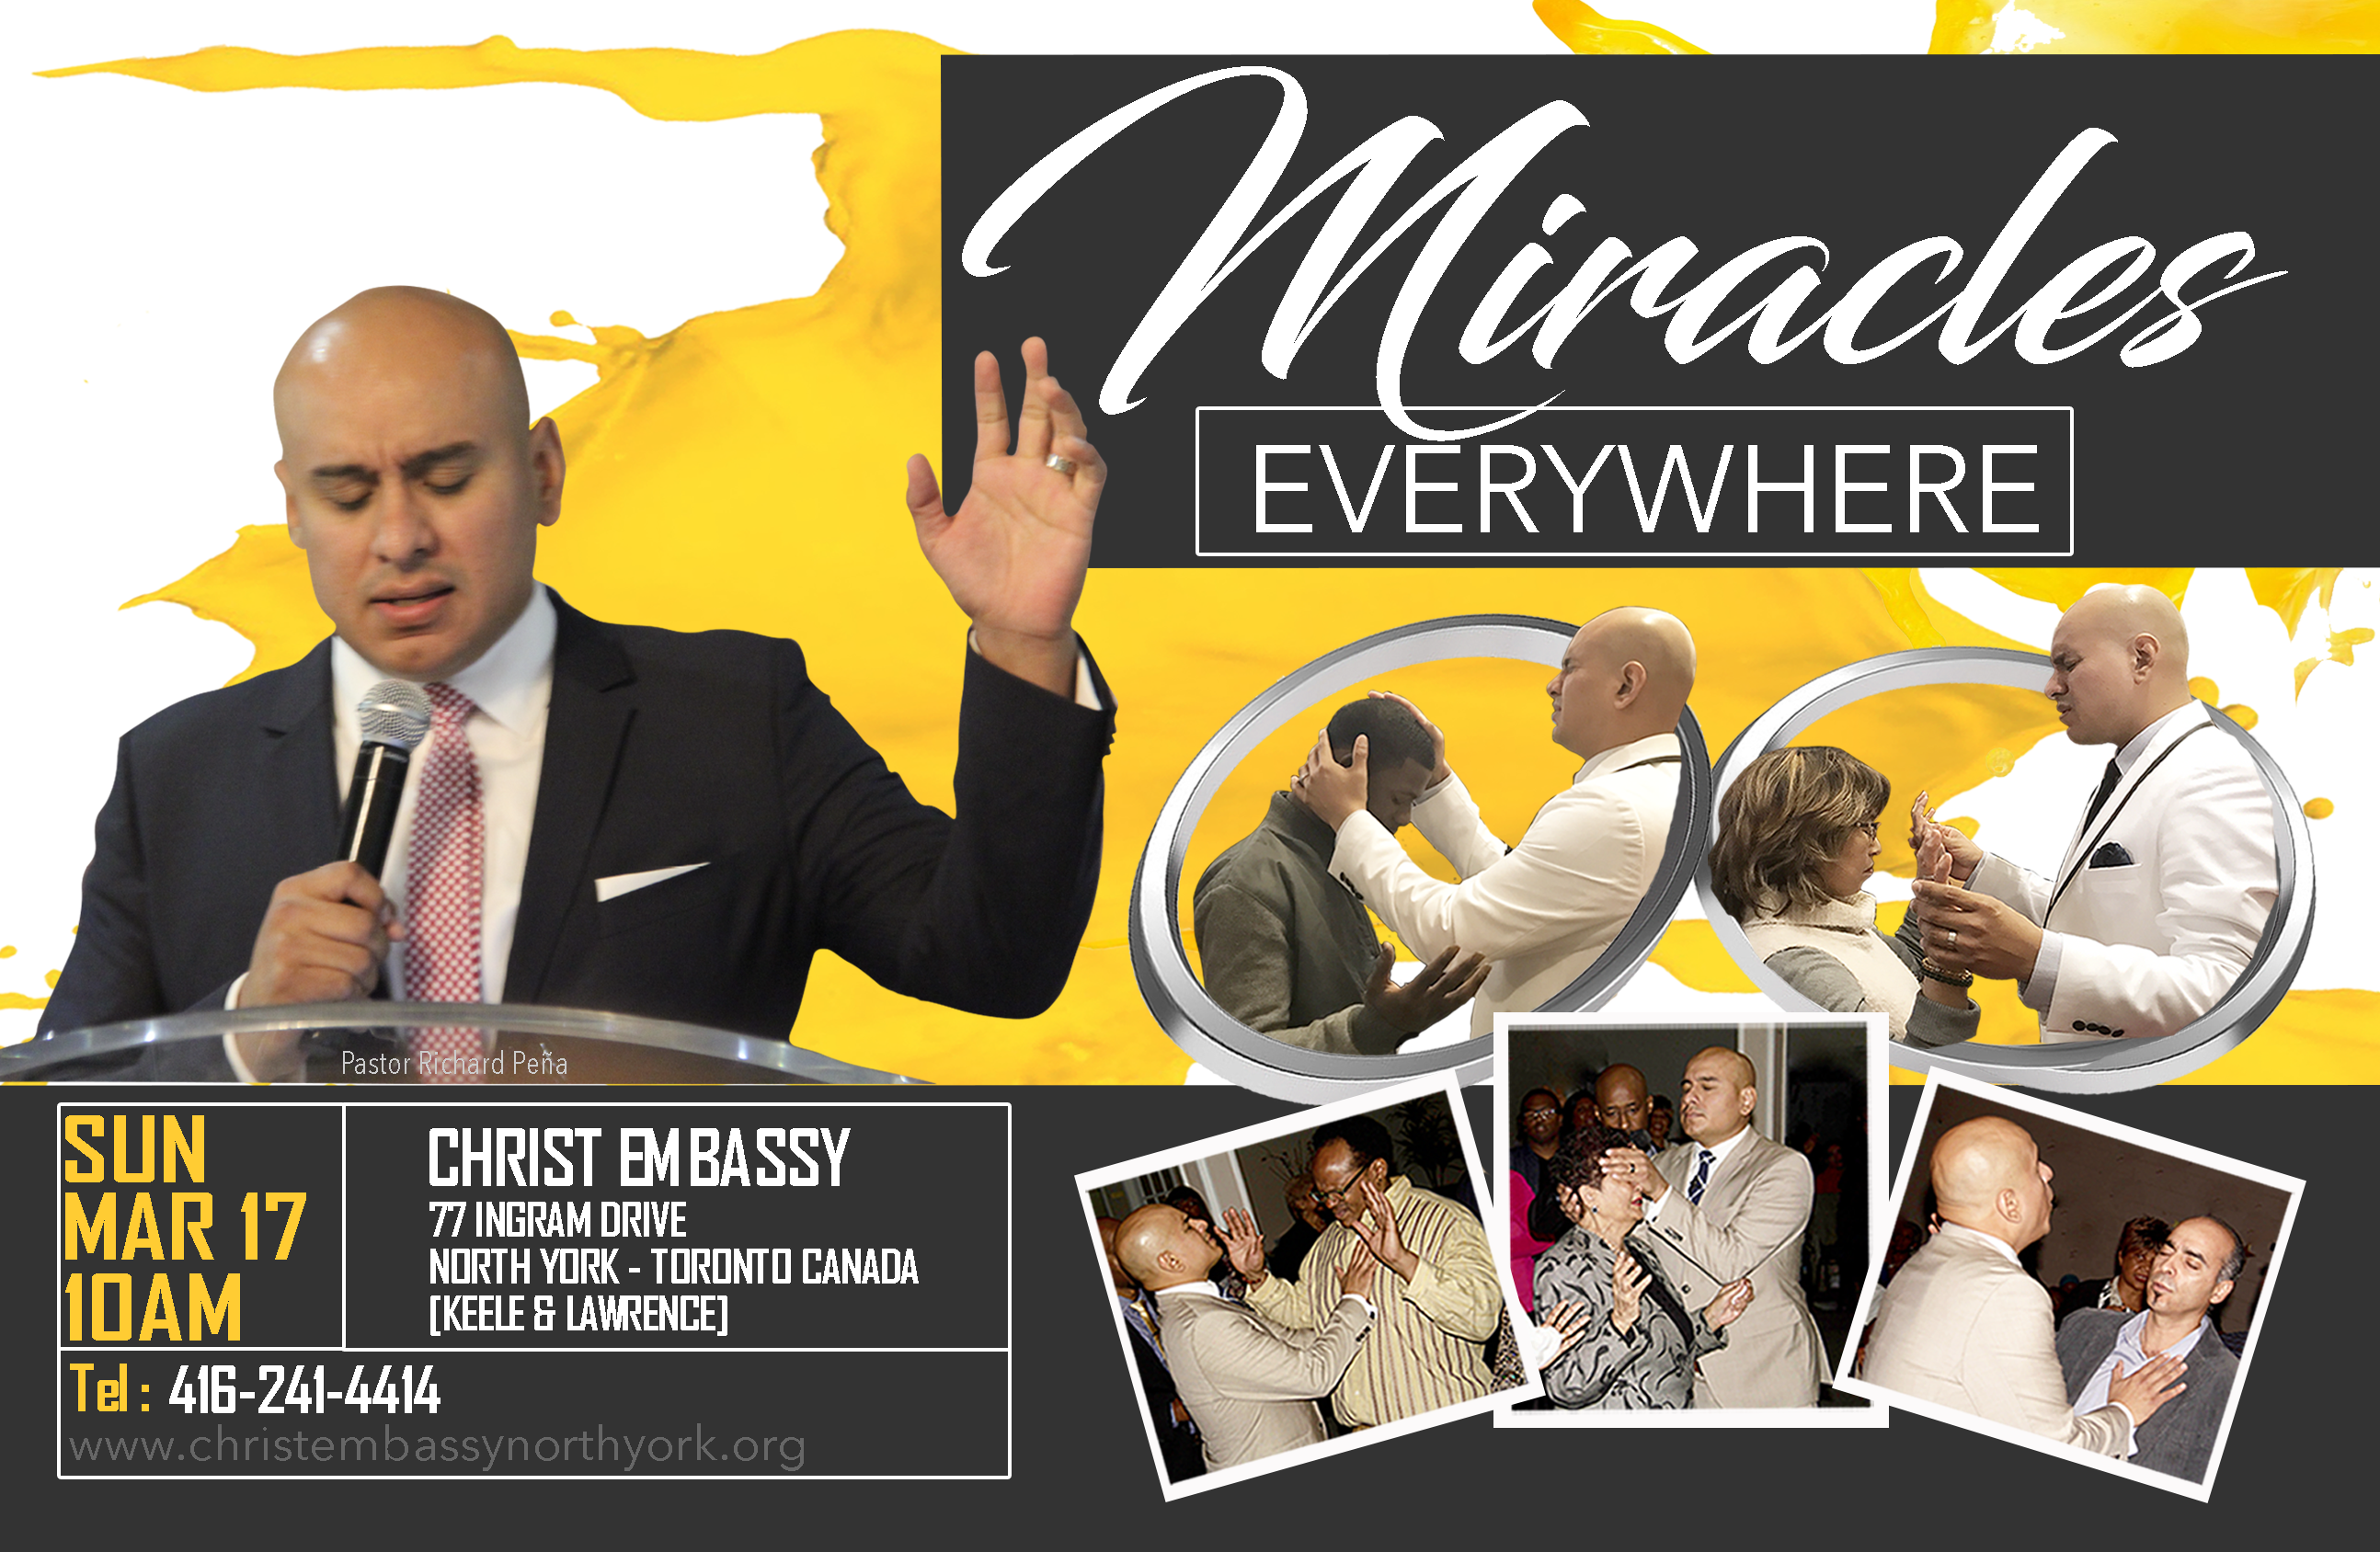 Miracles Everywhere Christ Embassy Toron